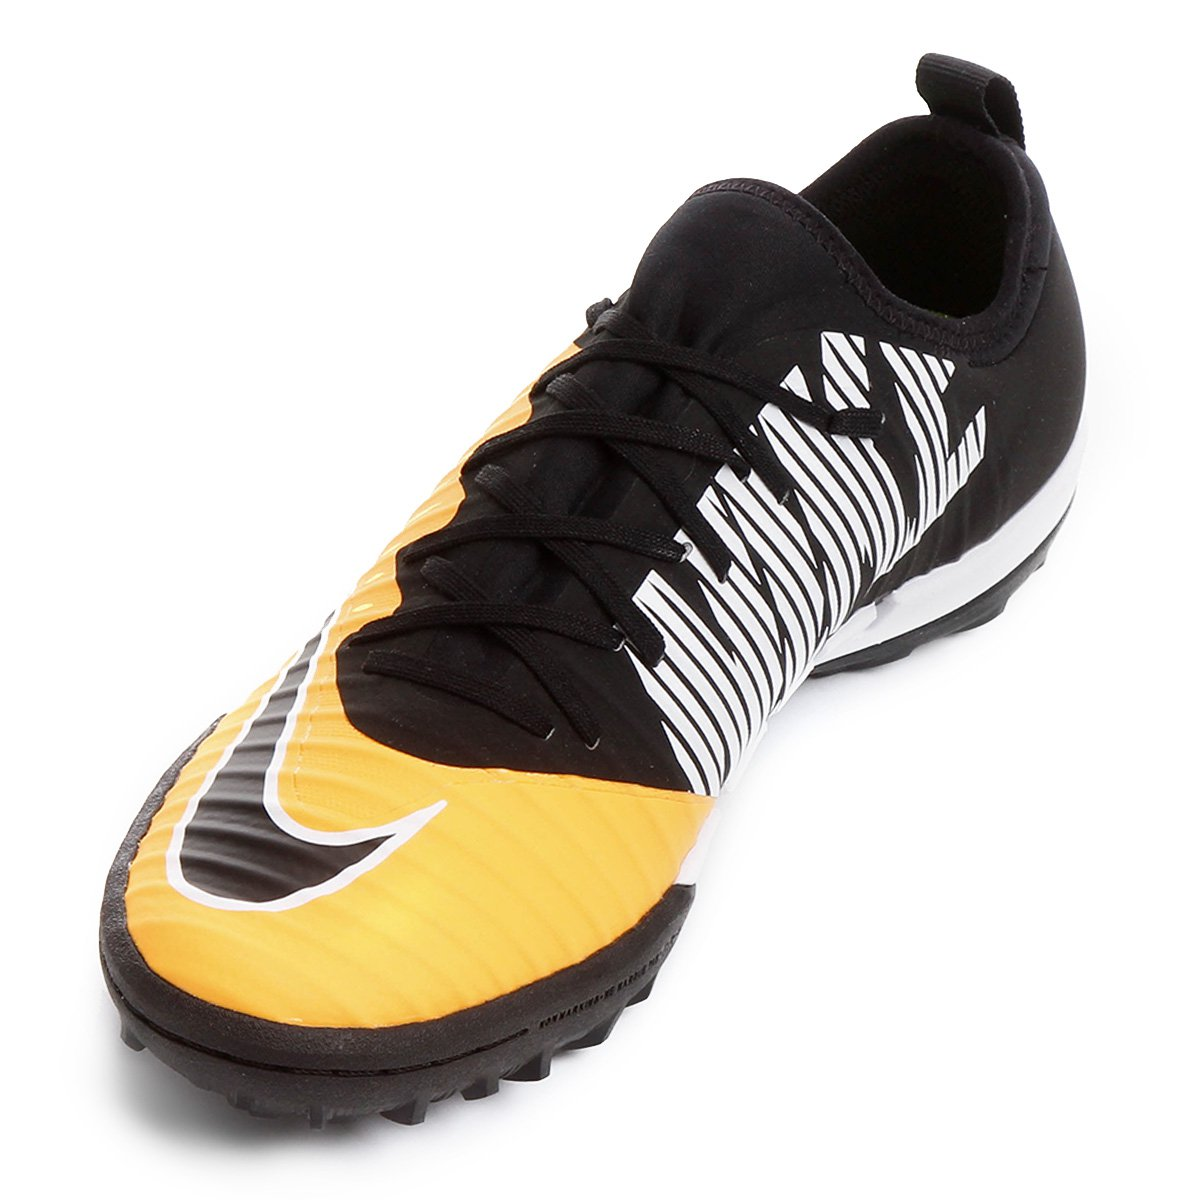 c581a7617a Chuteira Society Nike Mercurial Finale 2 TF - Laranja e Preto ...